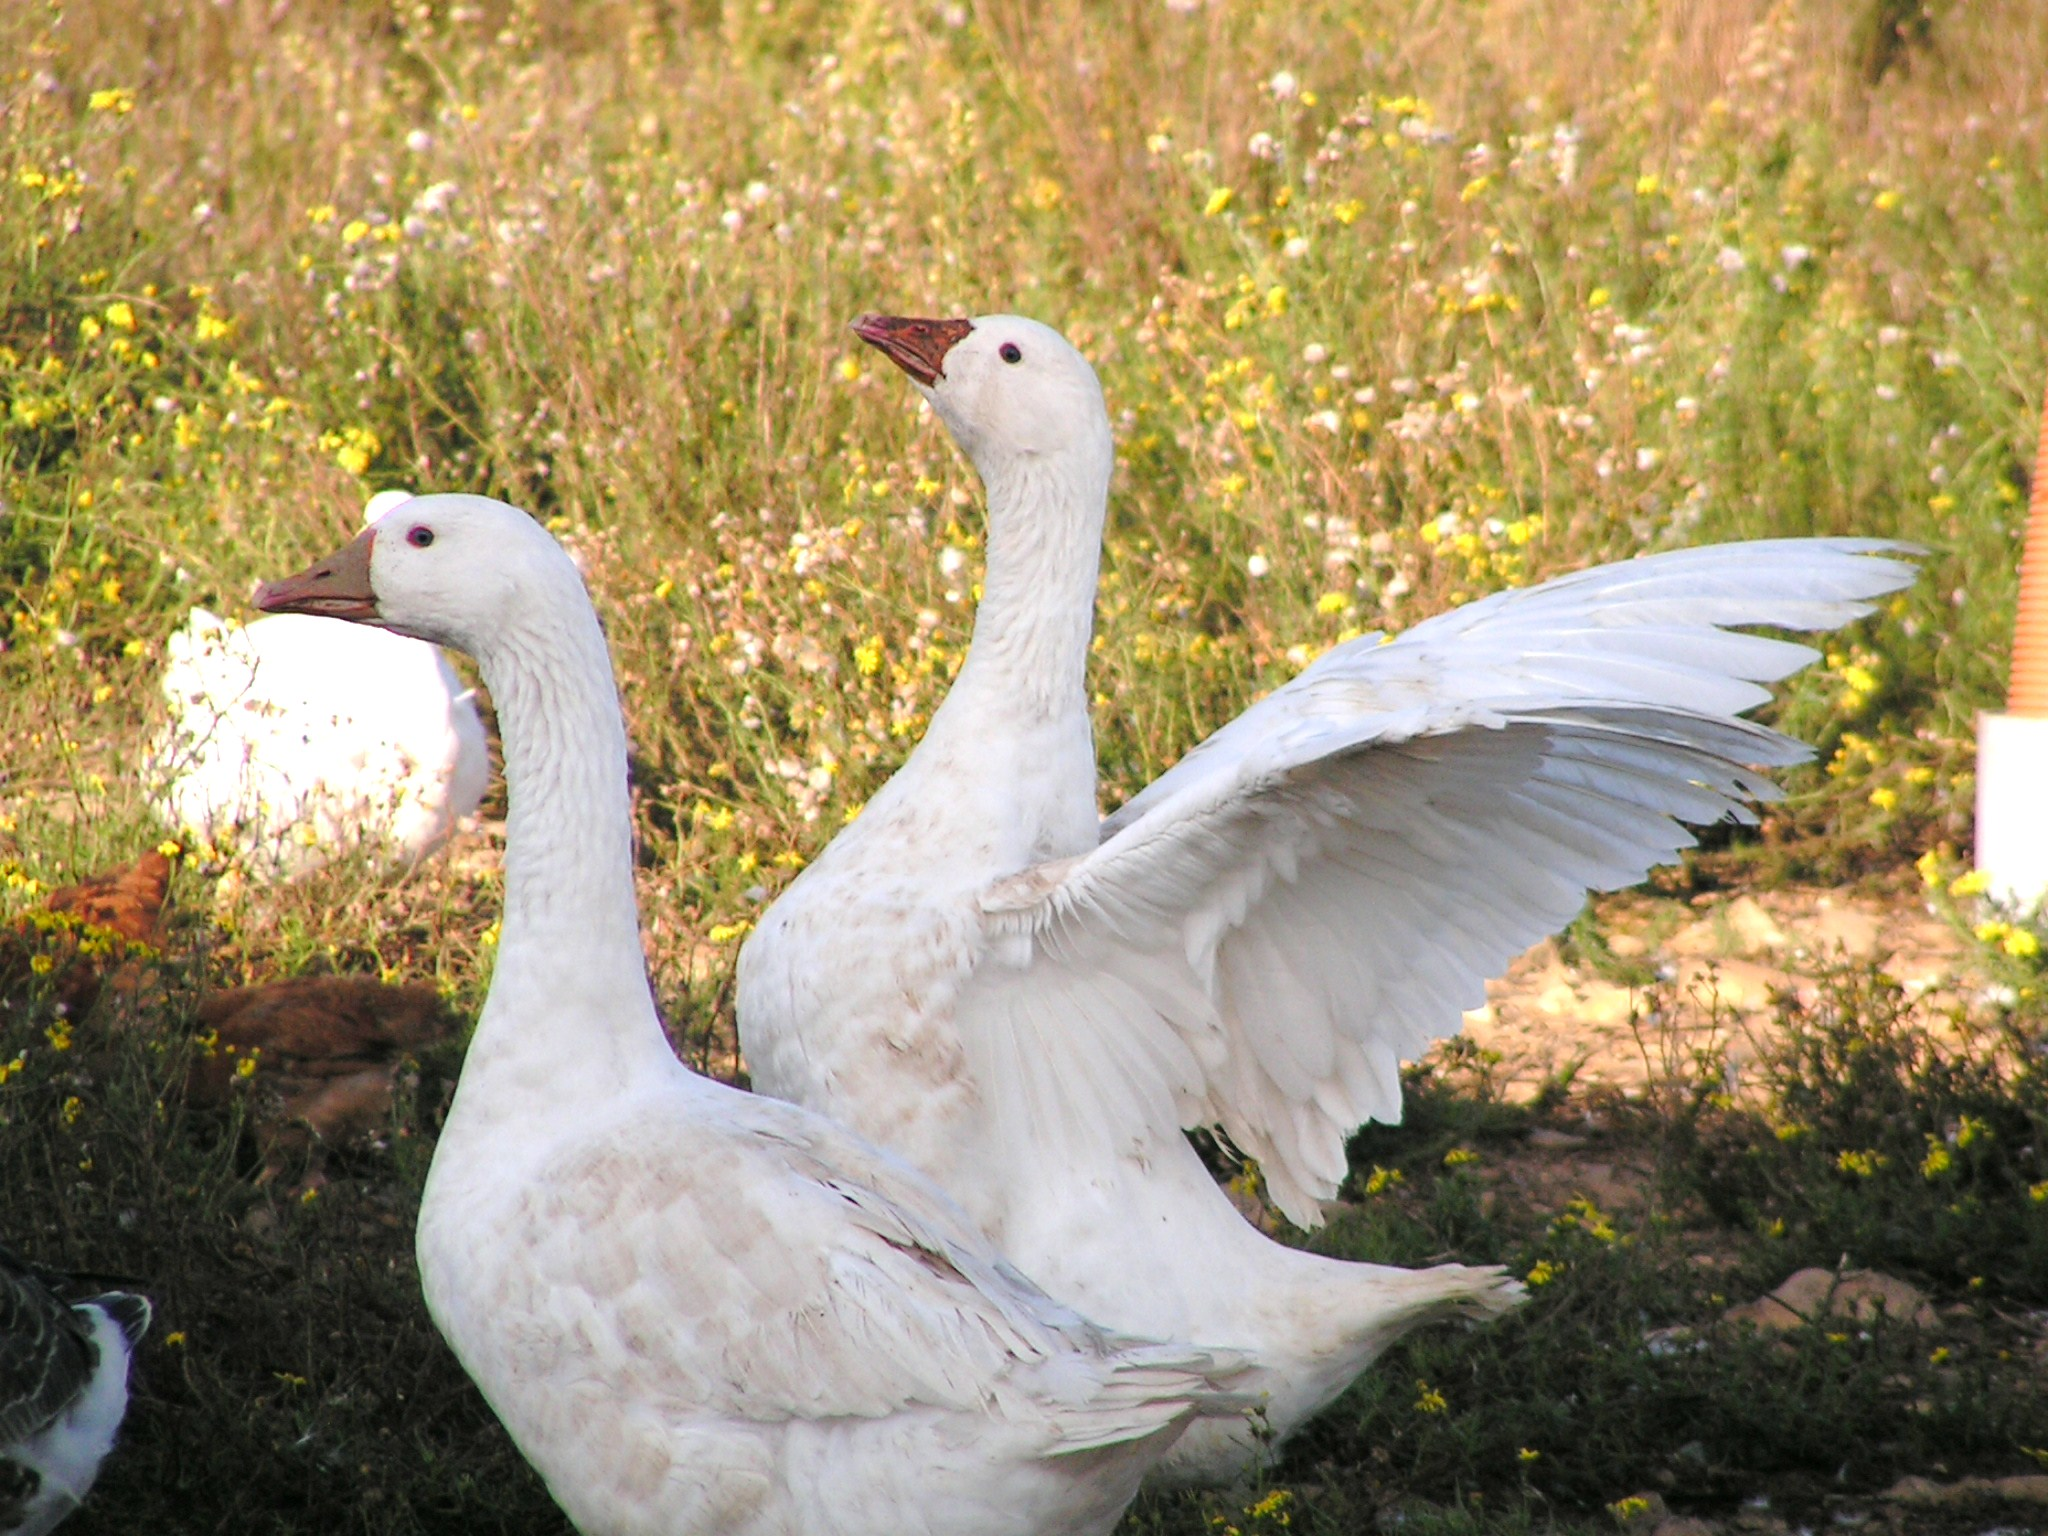 Elevage plume et poil dans l'herault